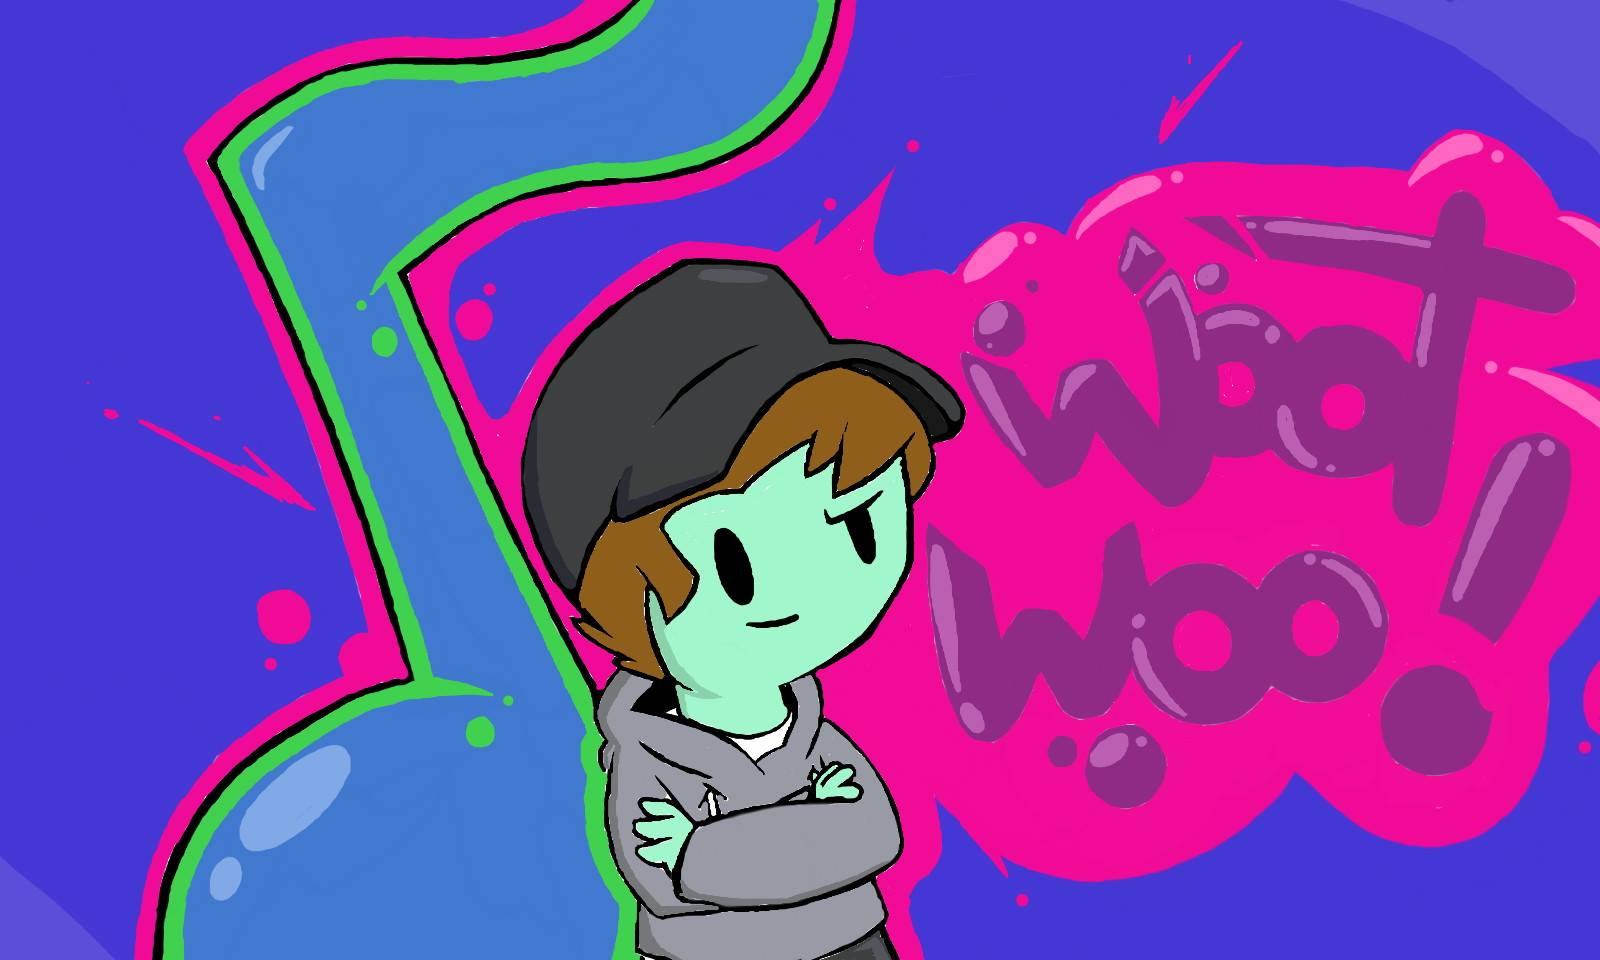 Woot-W00!!!!